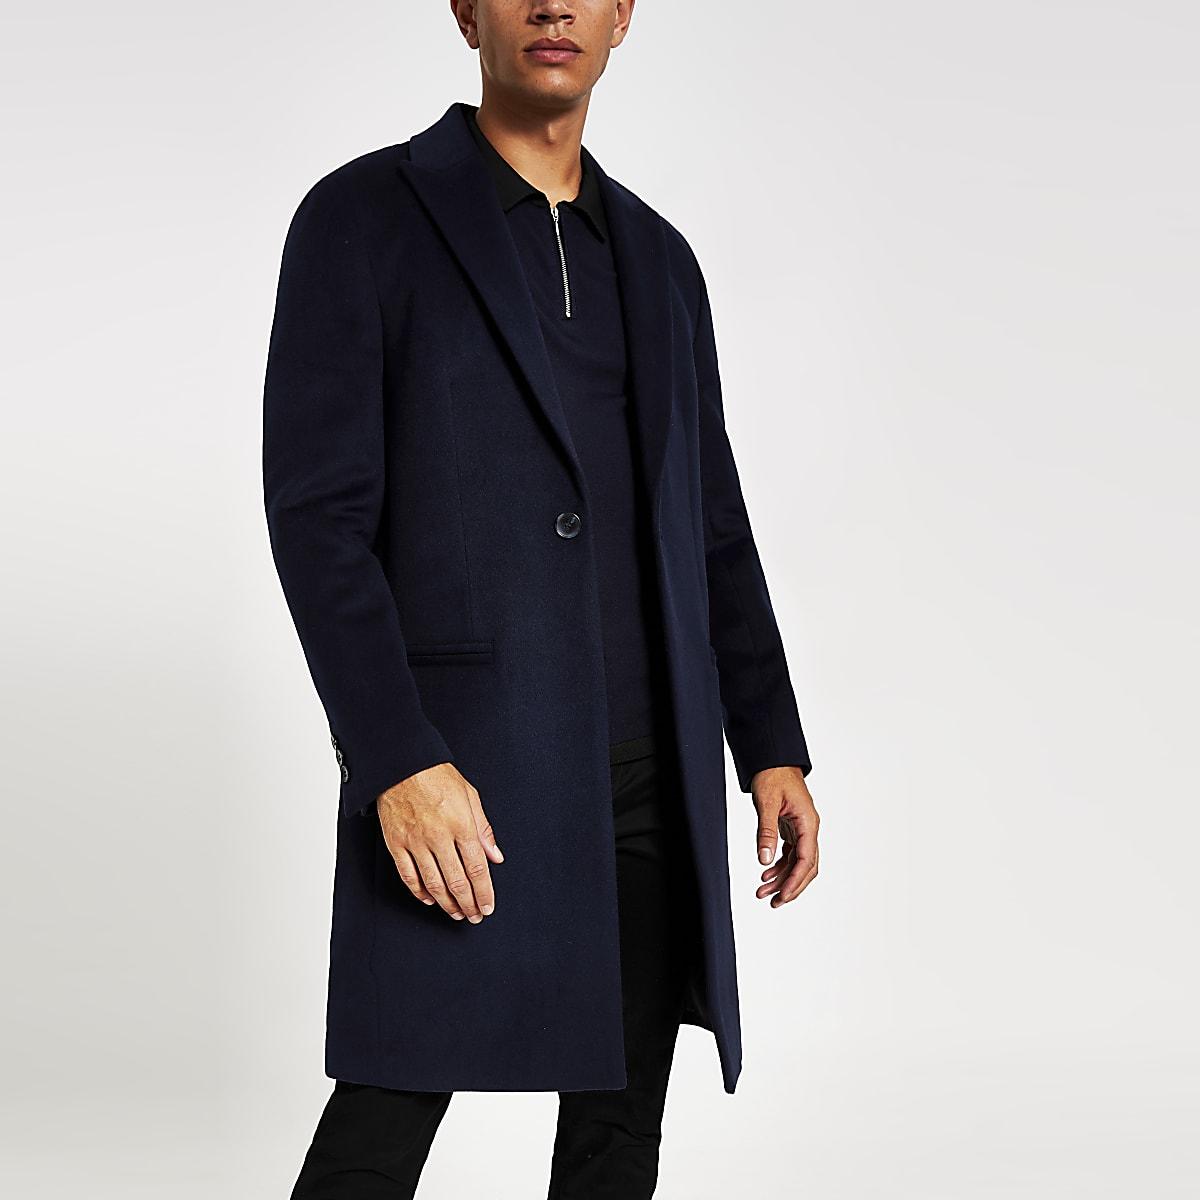 Dark navy single breasted overcoat